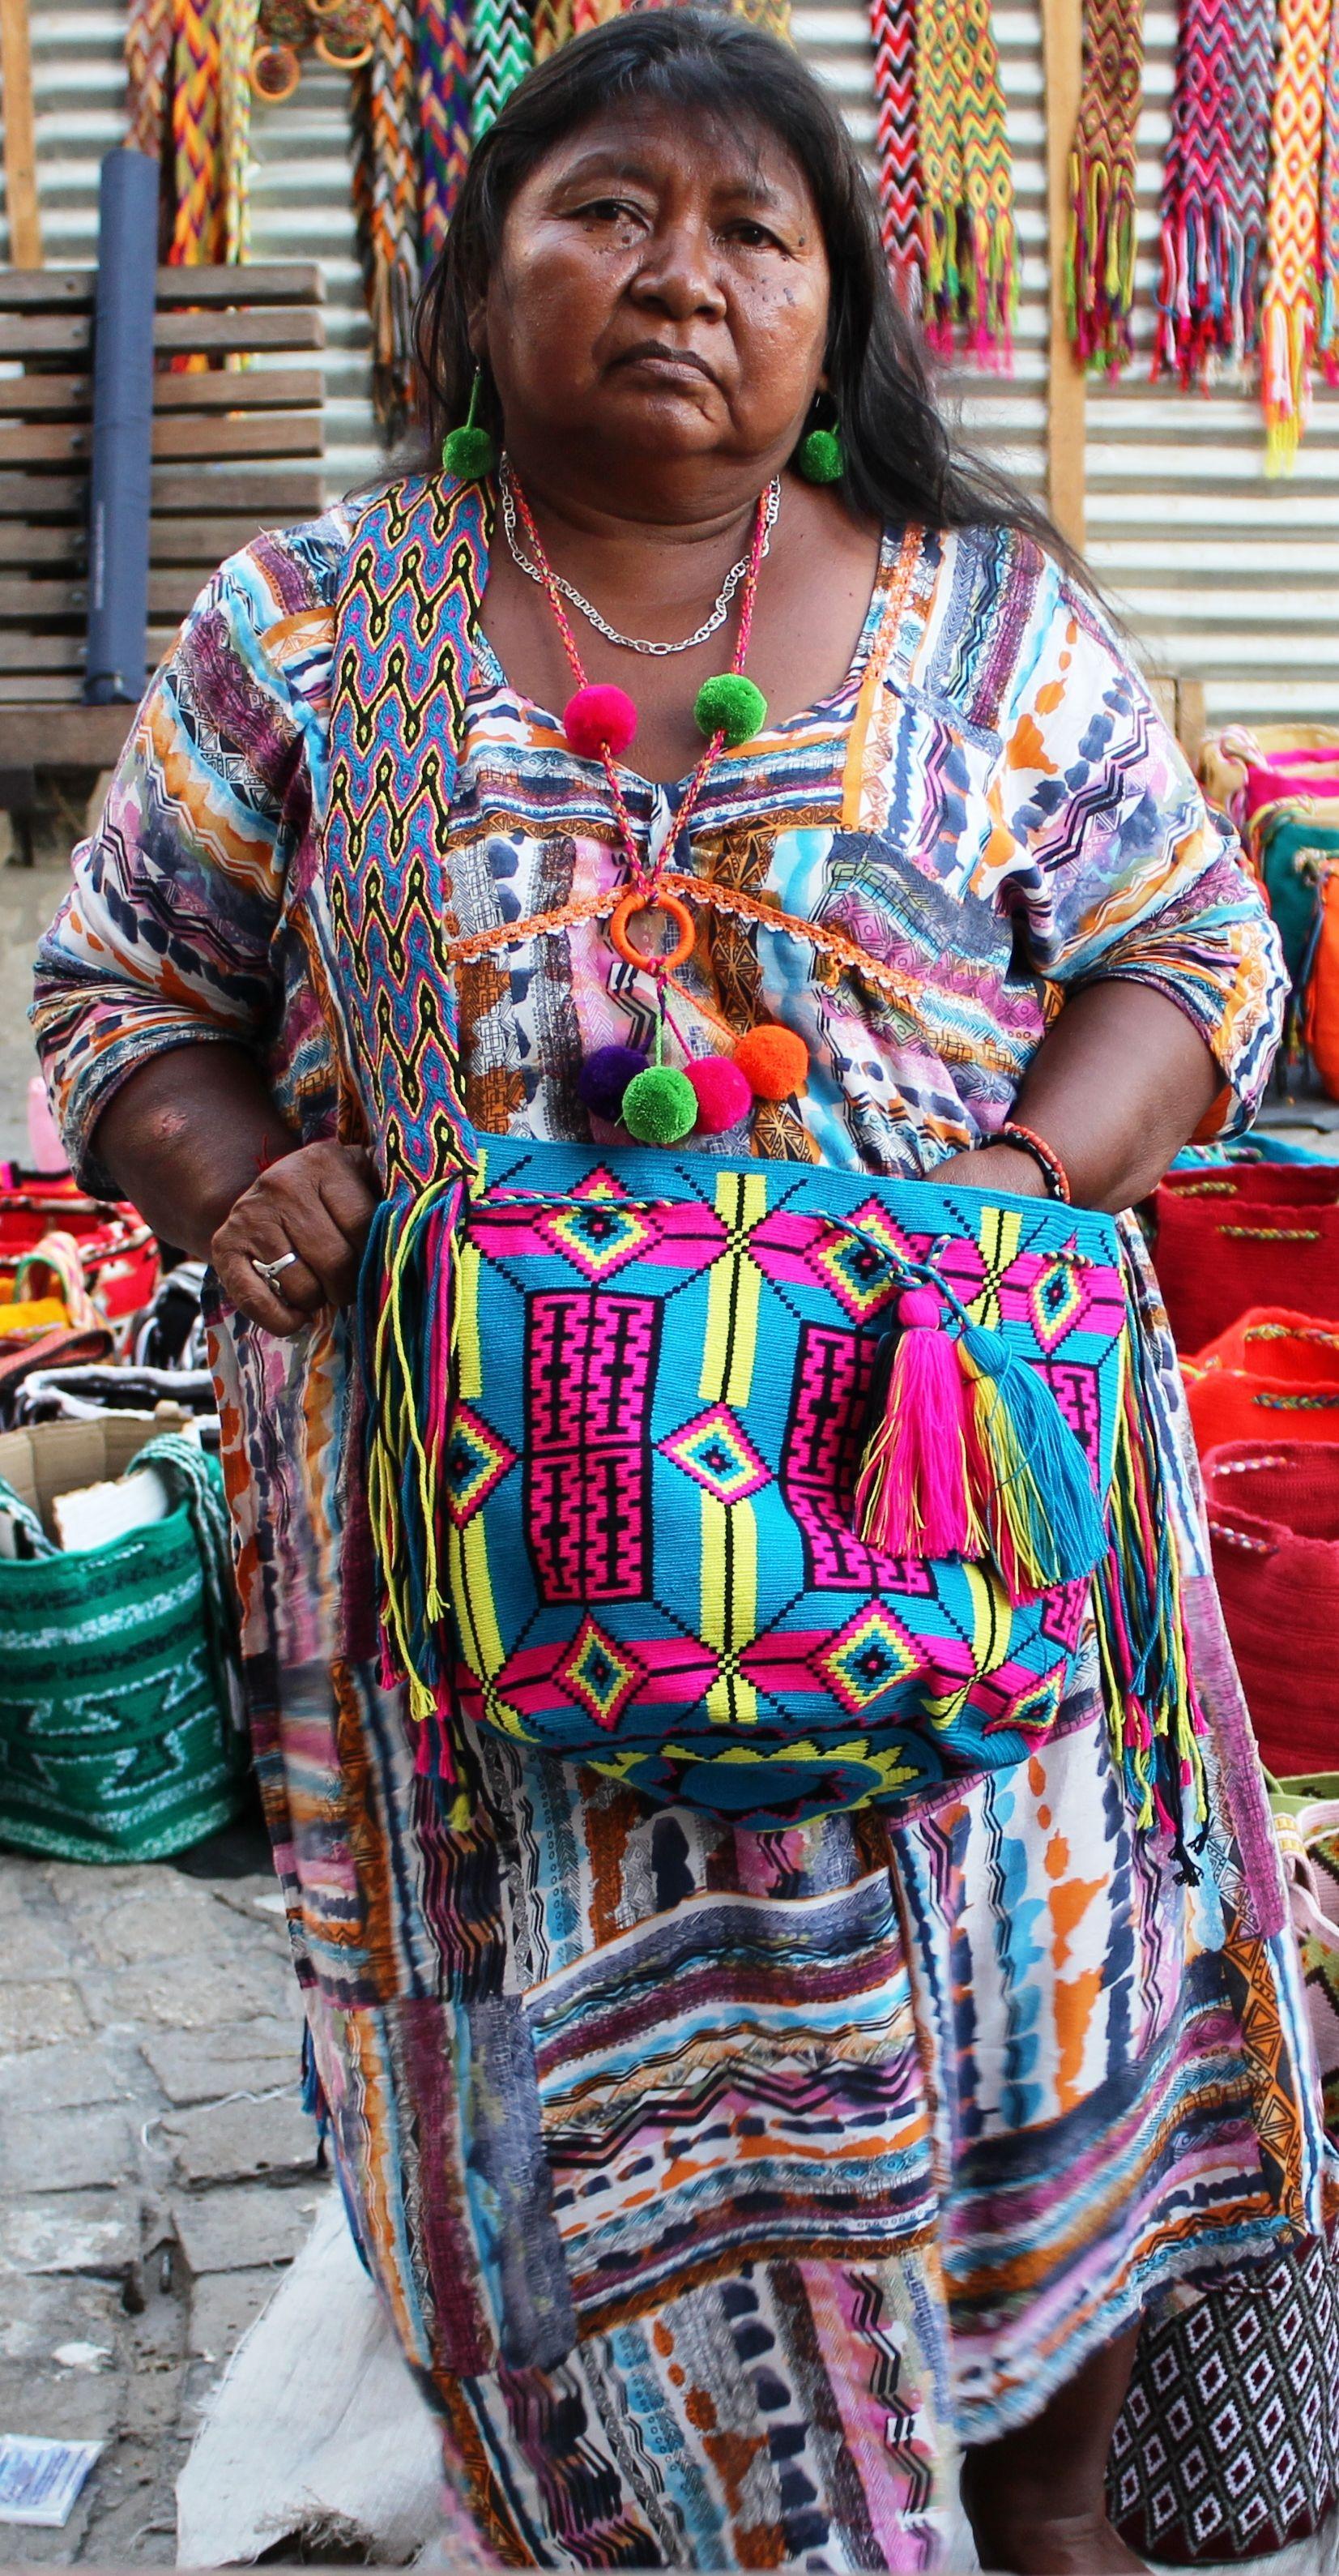 Wayuu Indian artesana Carmen wearing a traditional Wayuu dress, necklace, earrings and mochila